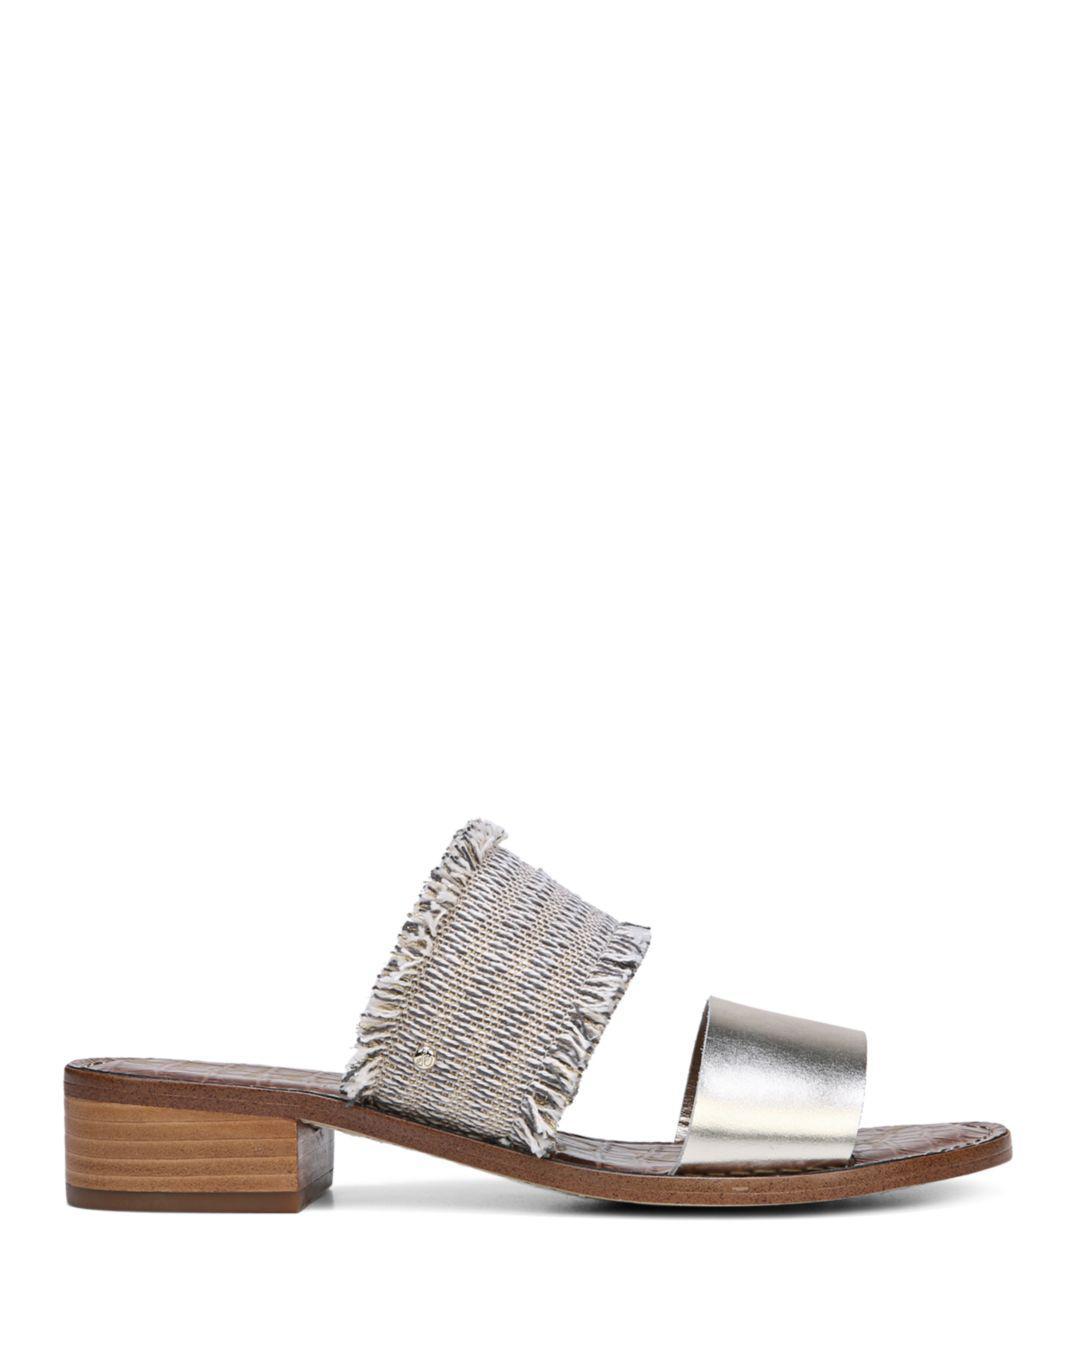 86d13dd24 Lyst - Sam Edelman Women s Jeni Metallic Leather   Fringe Slide ...